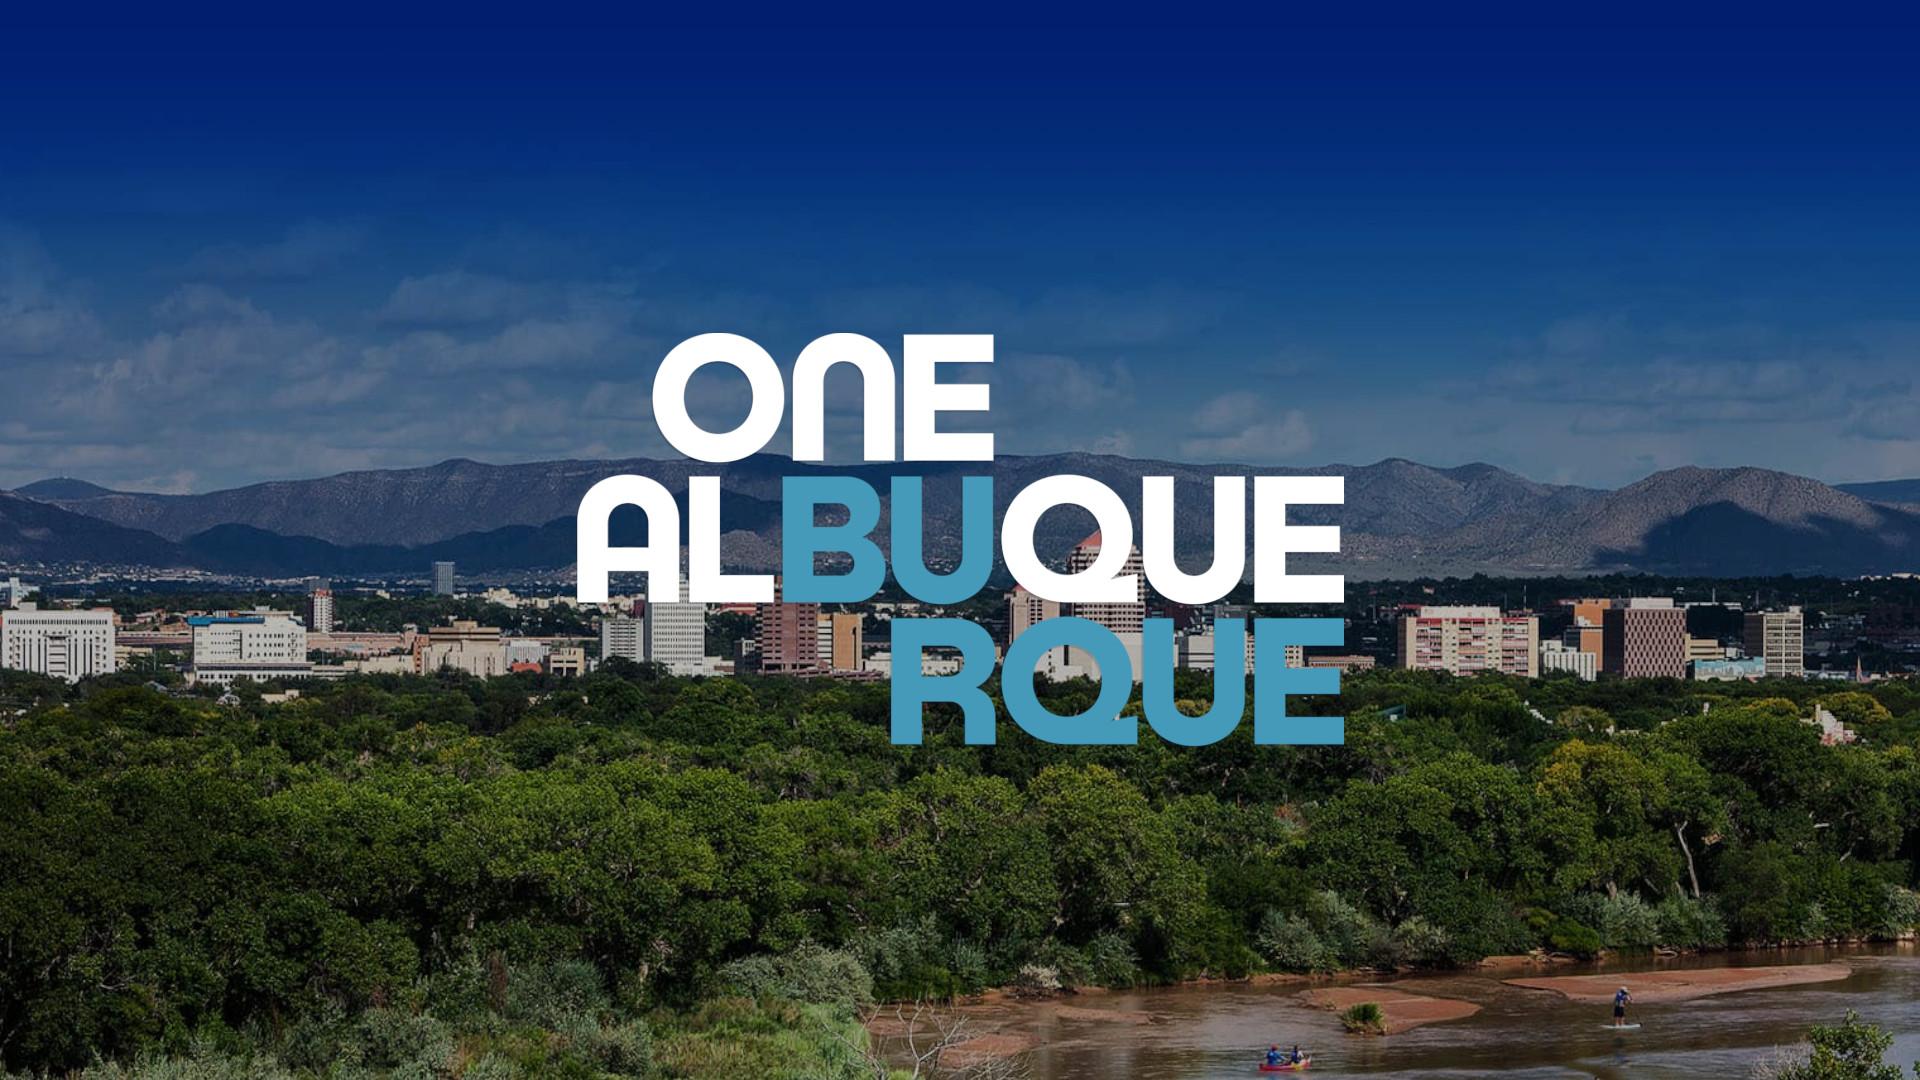 One Albuquerque, New Mexico